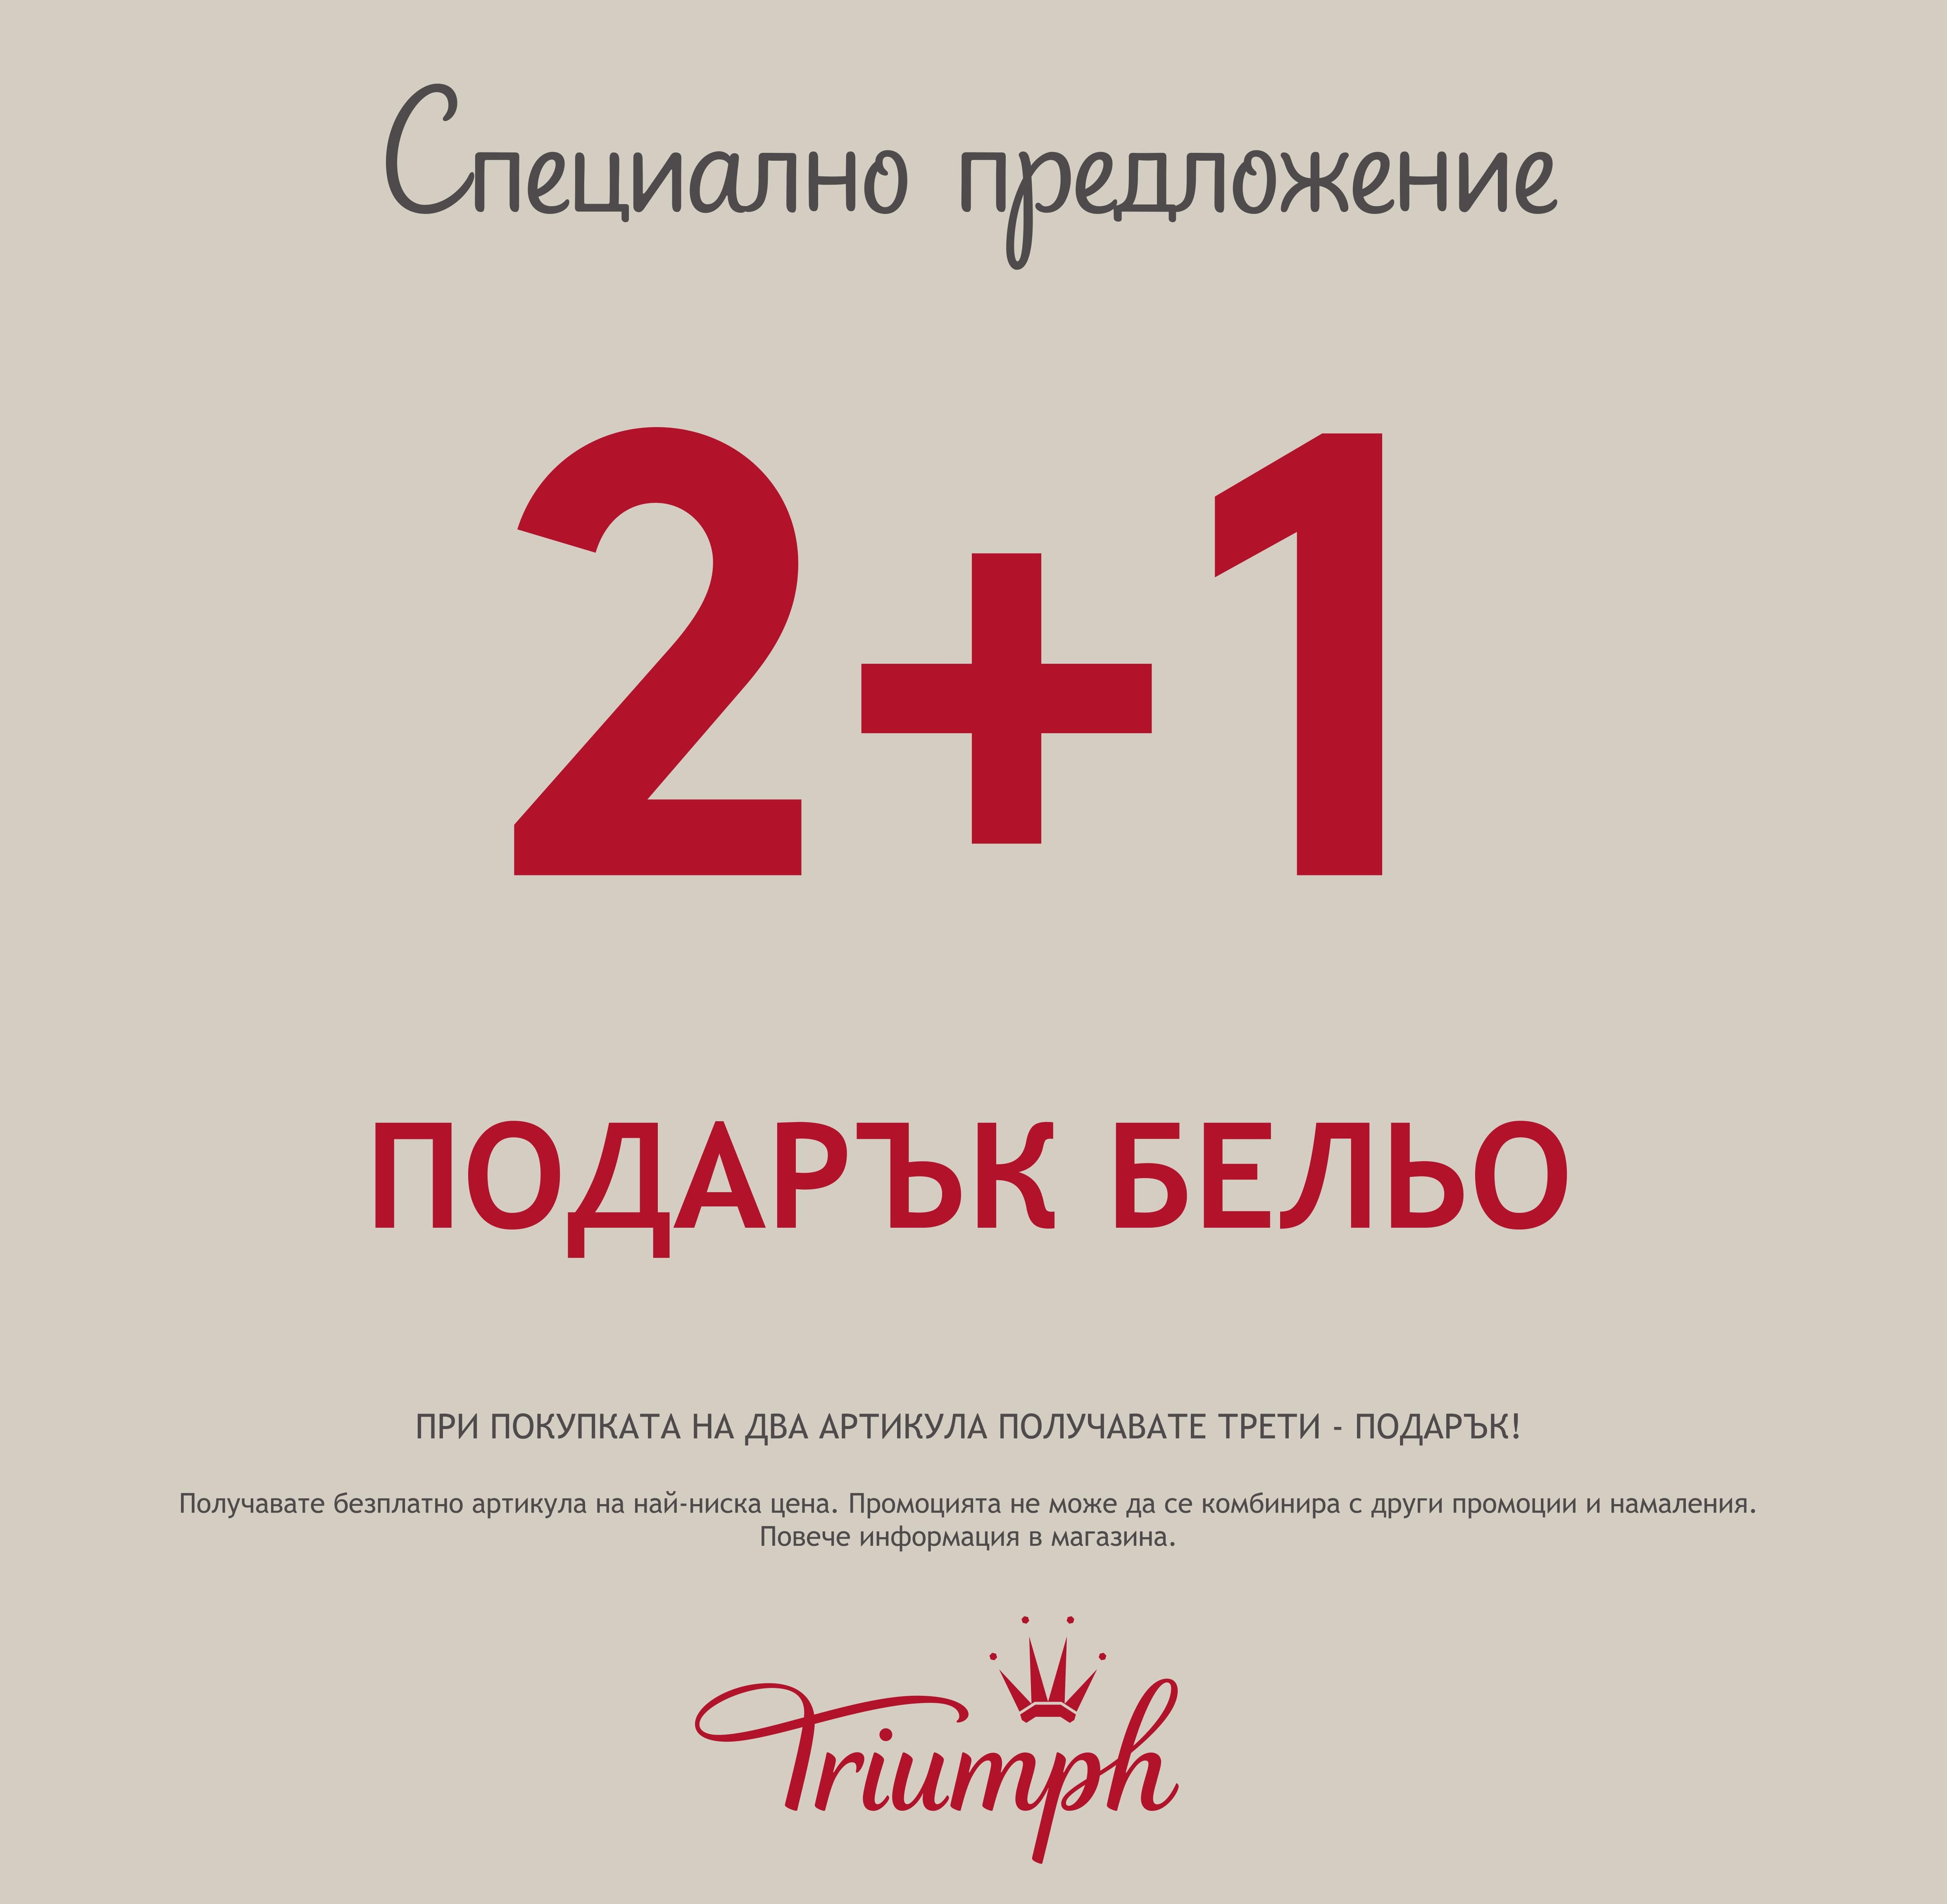 Промоция 2+1 в магазин Triumph